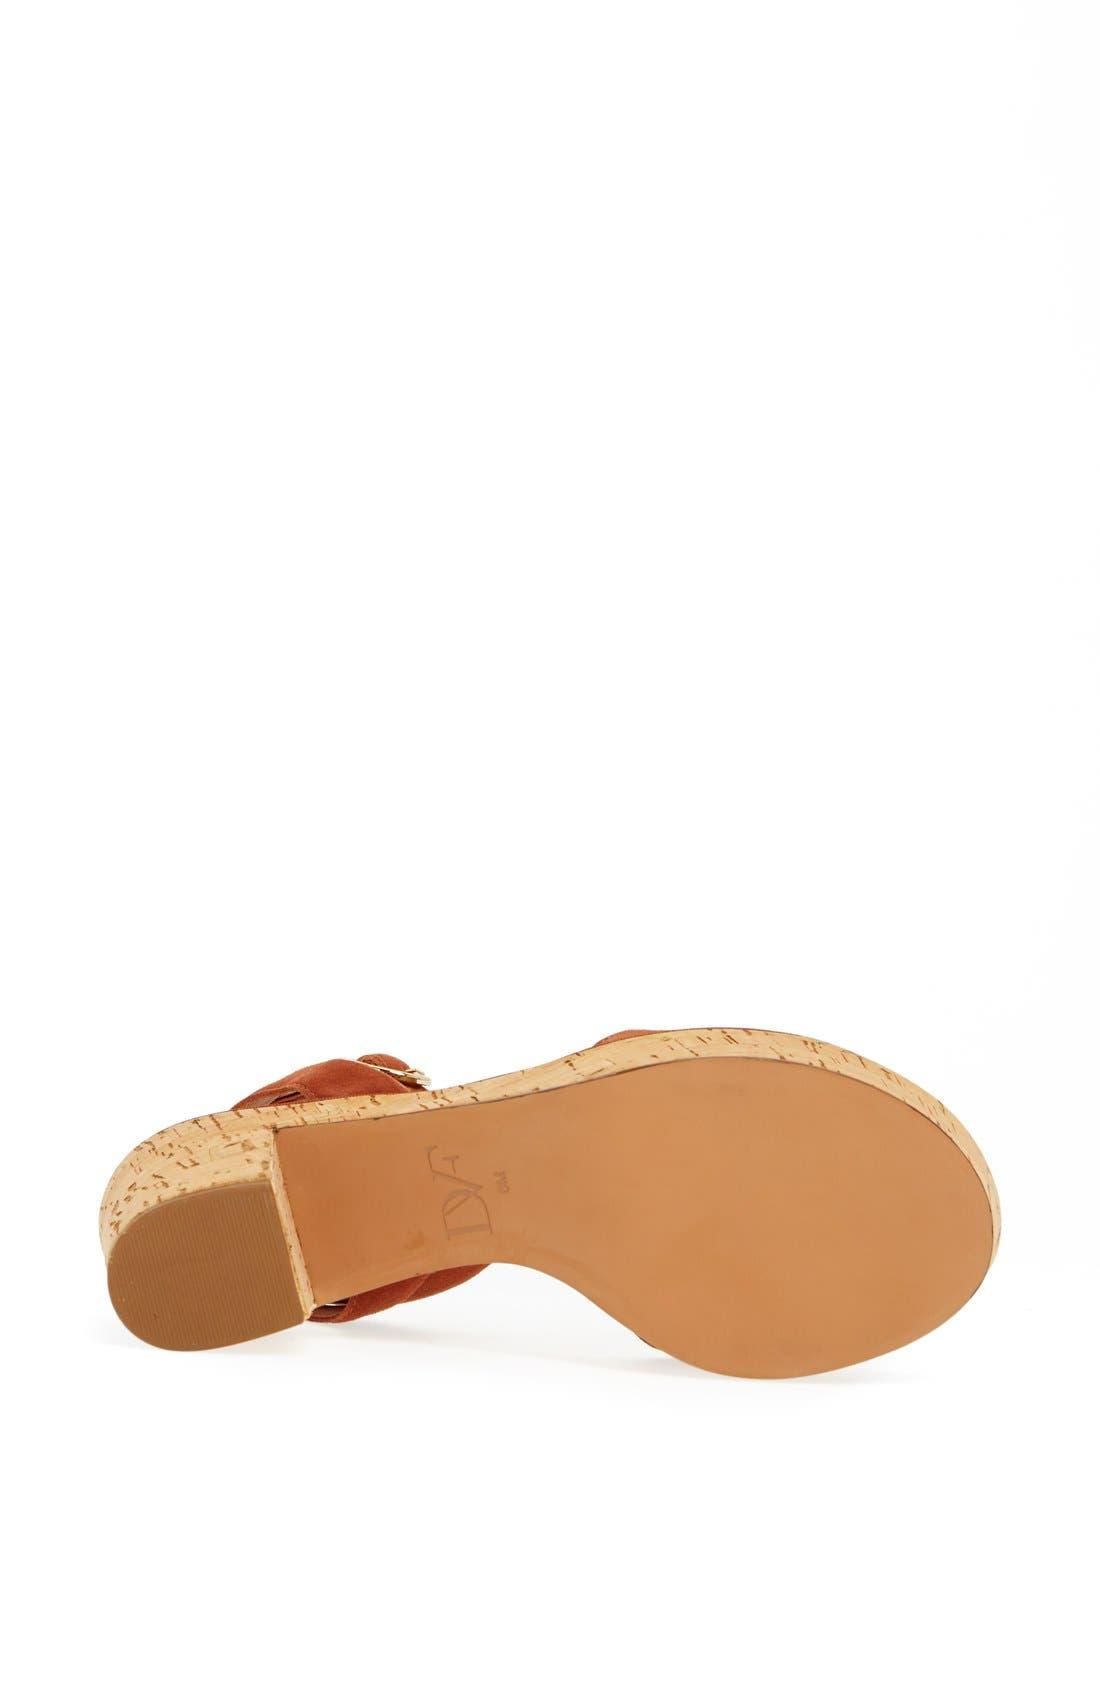 Alternate Image 3  - Diane von Furstenberg 'Odelia' Sandal (Online Only)